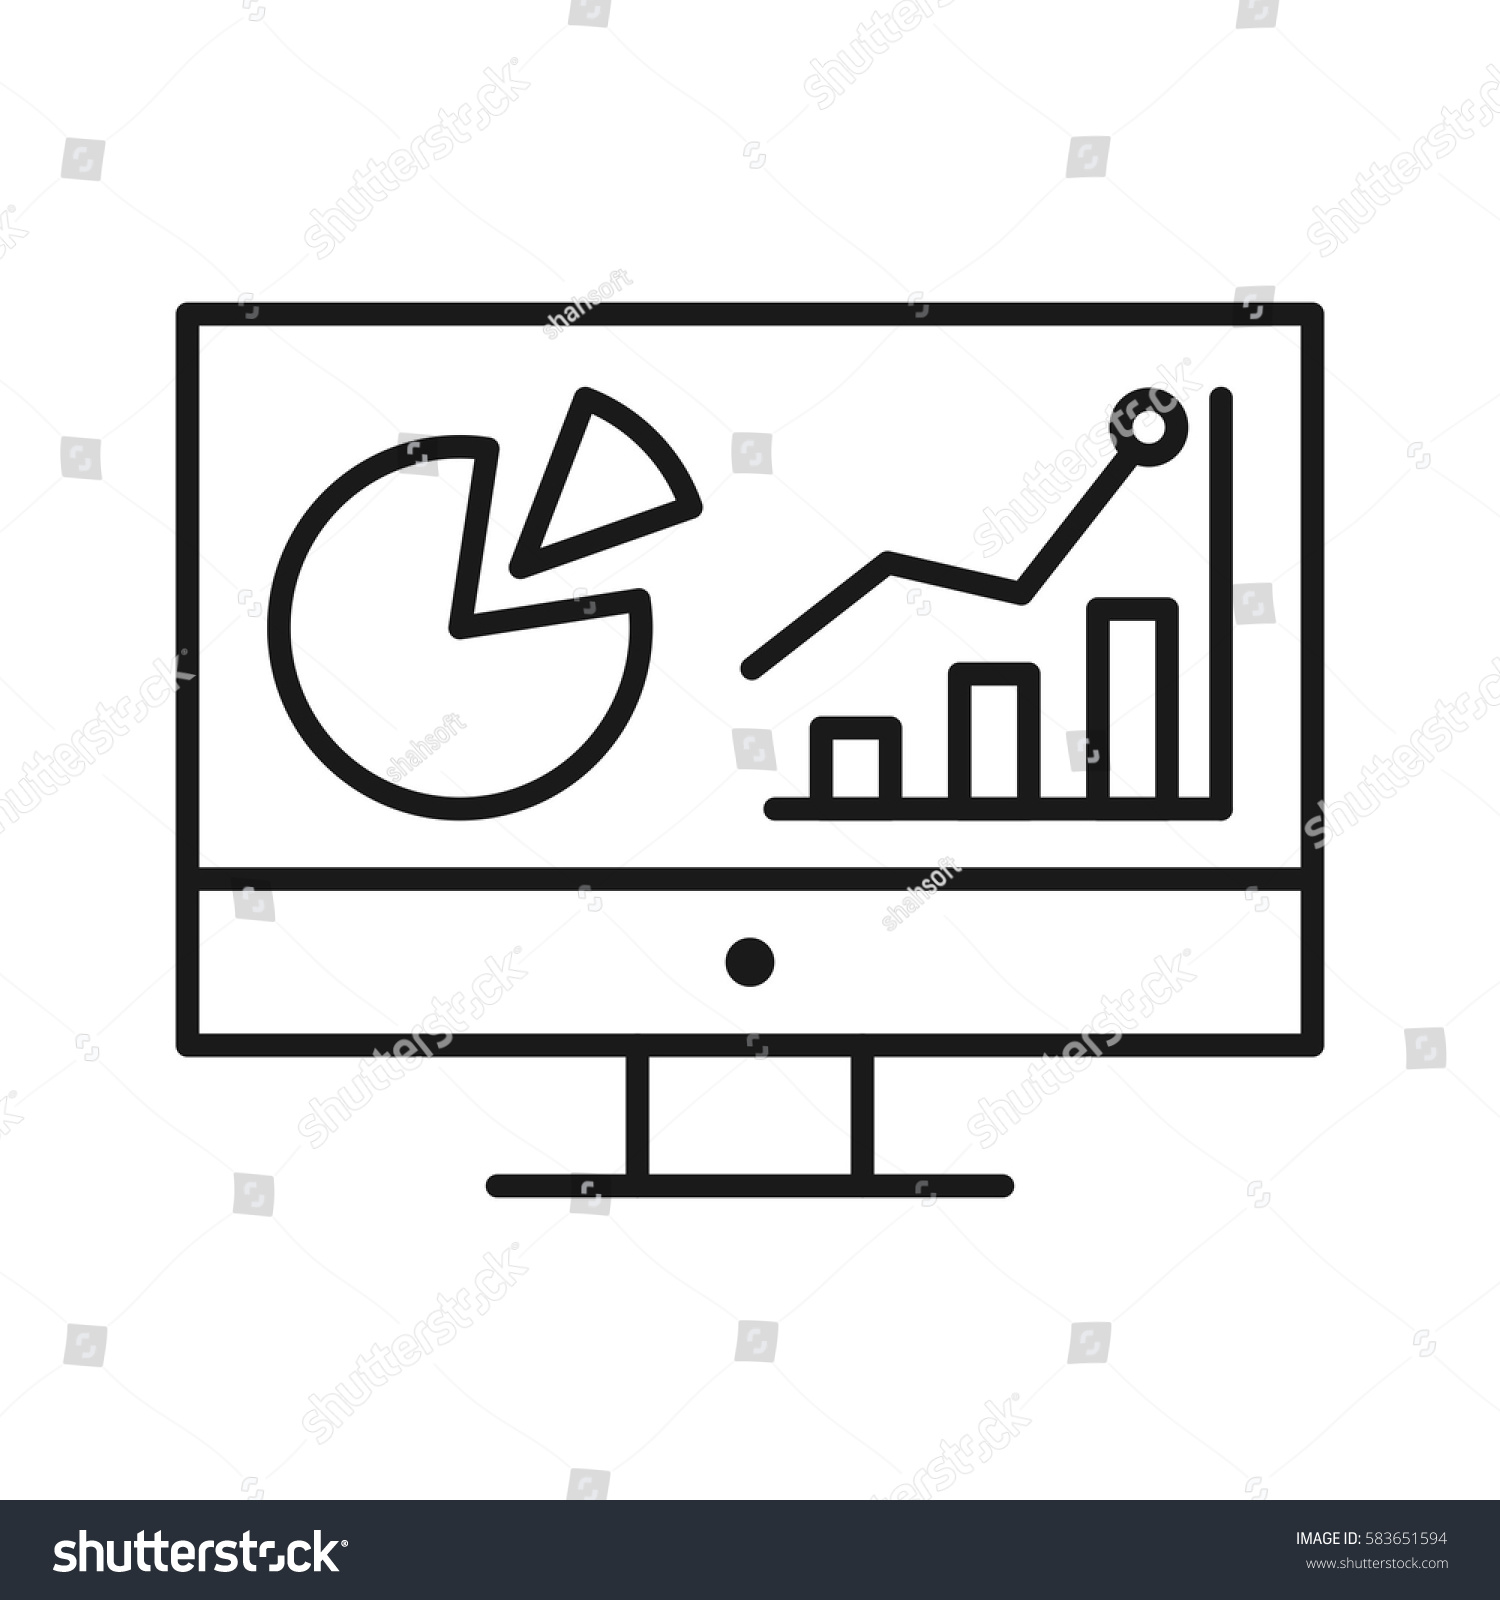 Analysis Line Icon Stock Vector 583651594 - Shutterstock